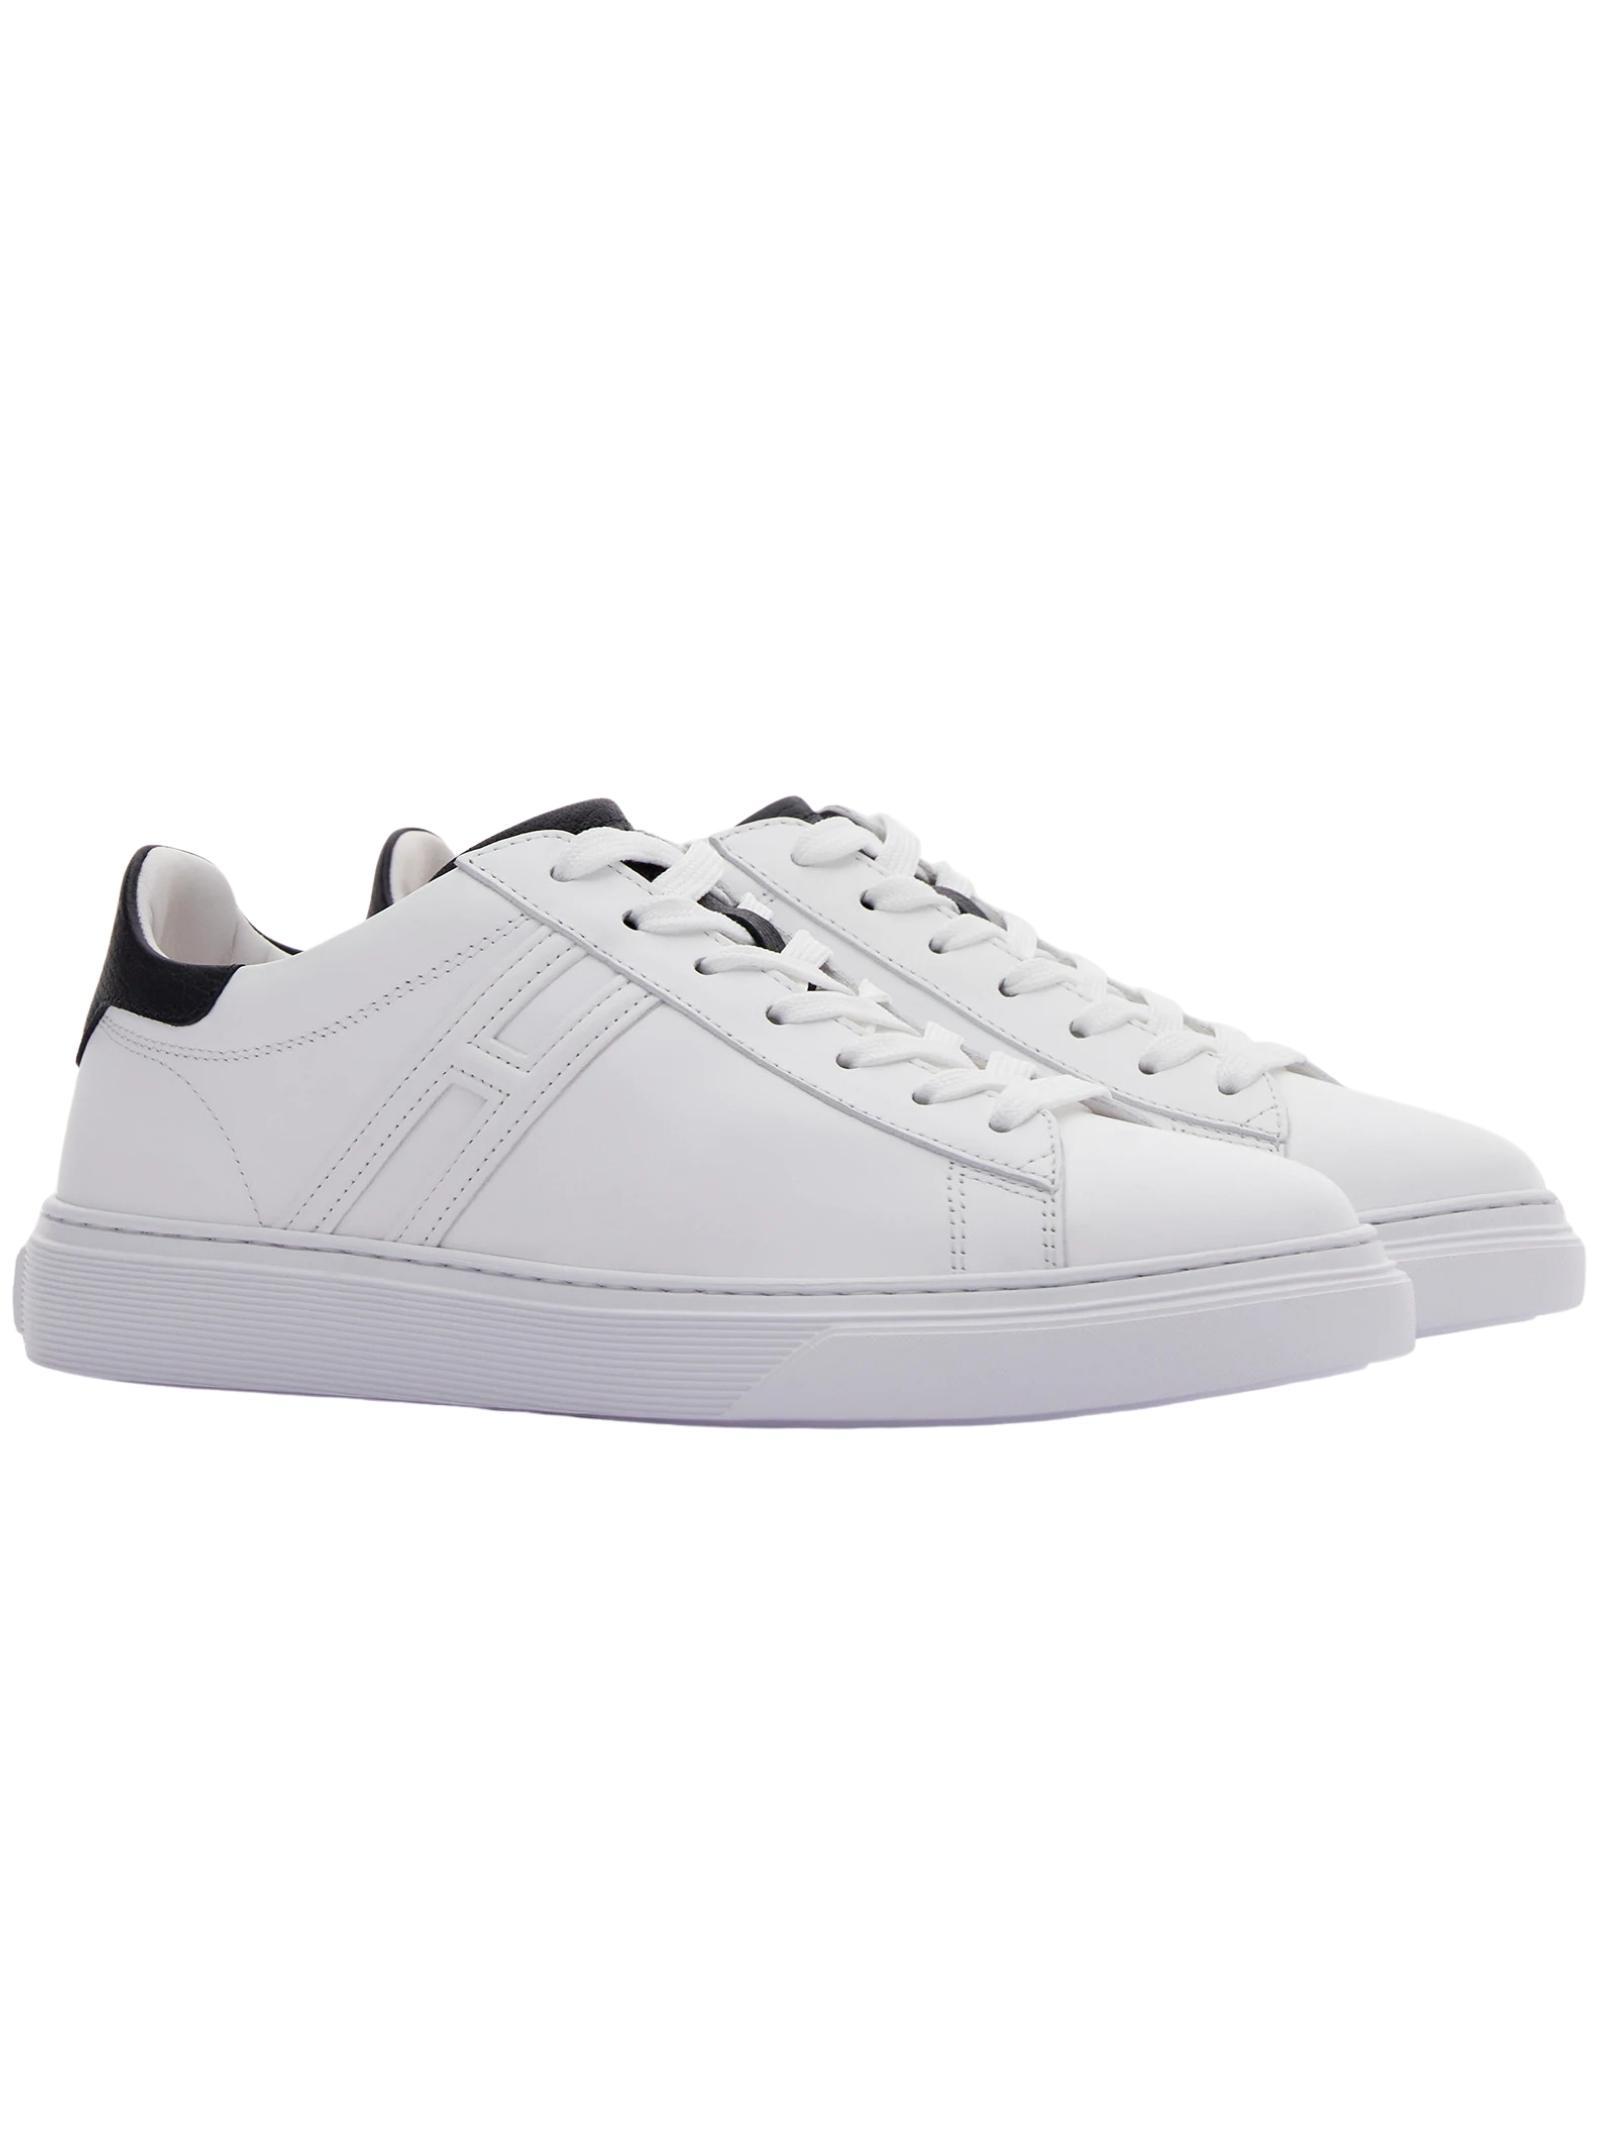 Sneakers Hogan in pelle scamosciata bianca HOGAN   Scarpe   HXM3650J960KFN0001